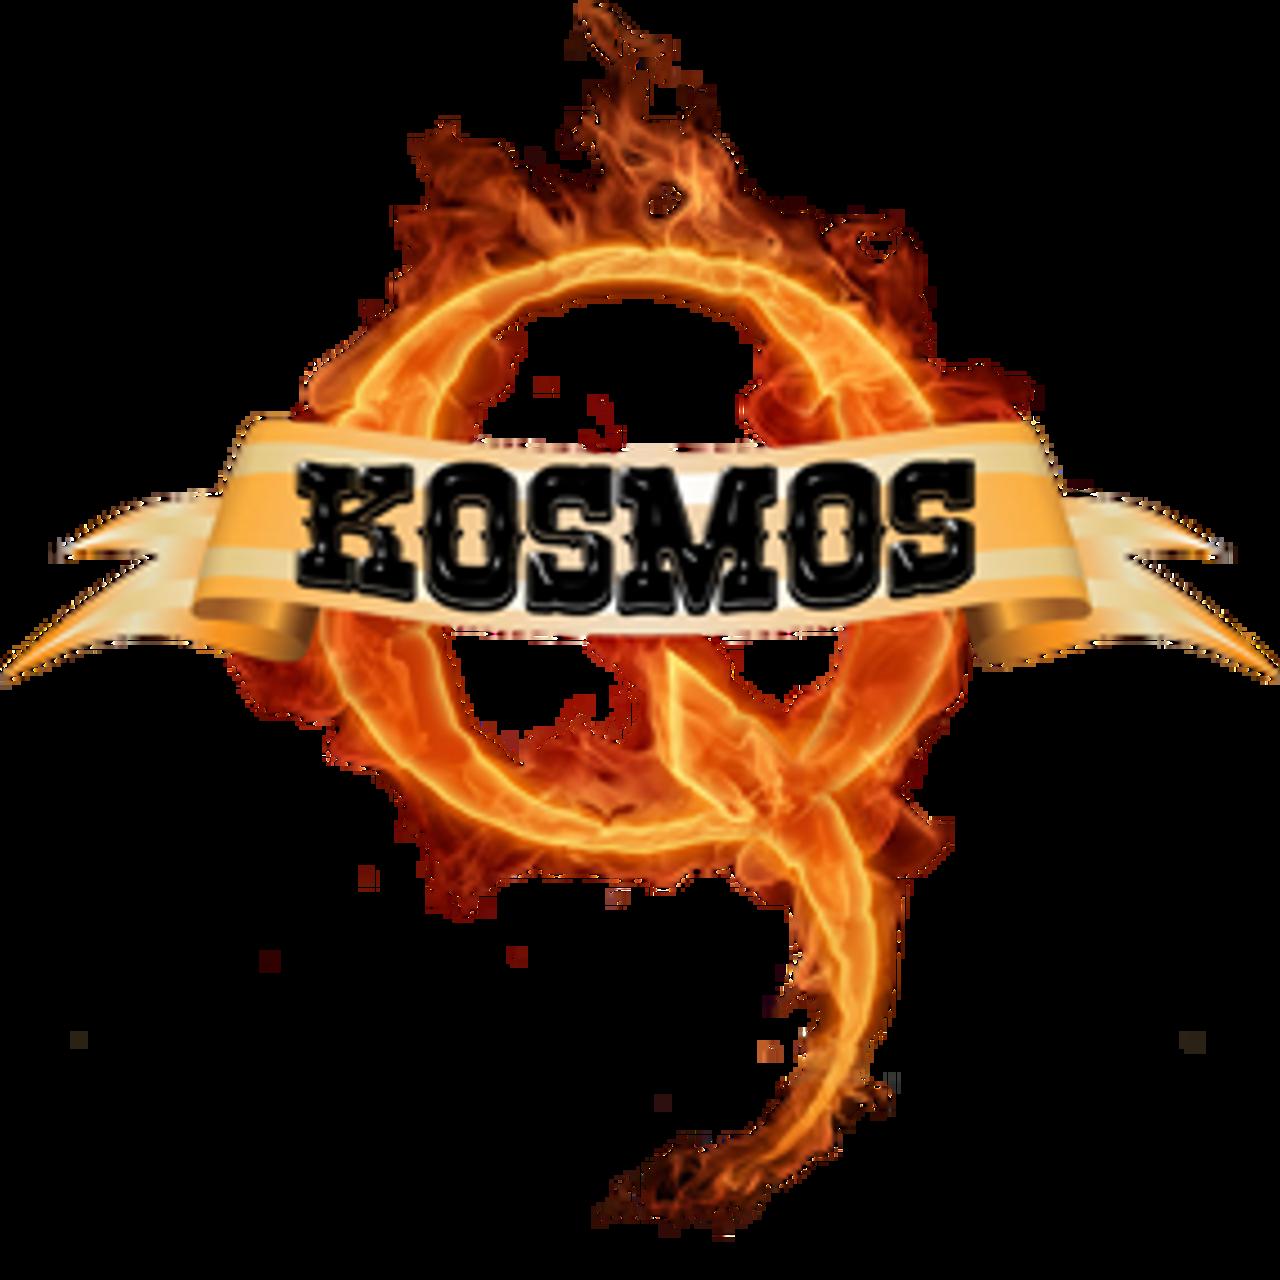 Kosmo's Q